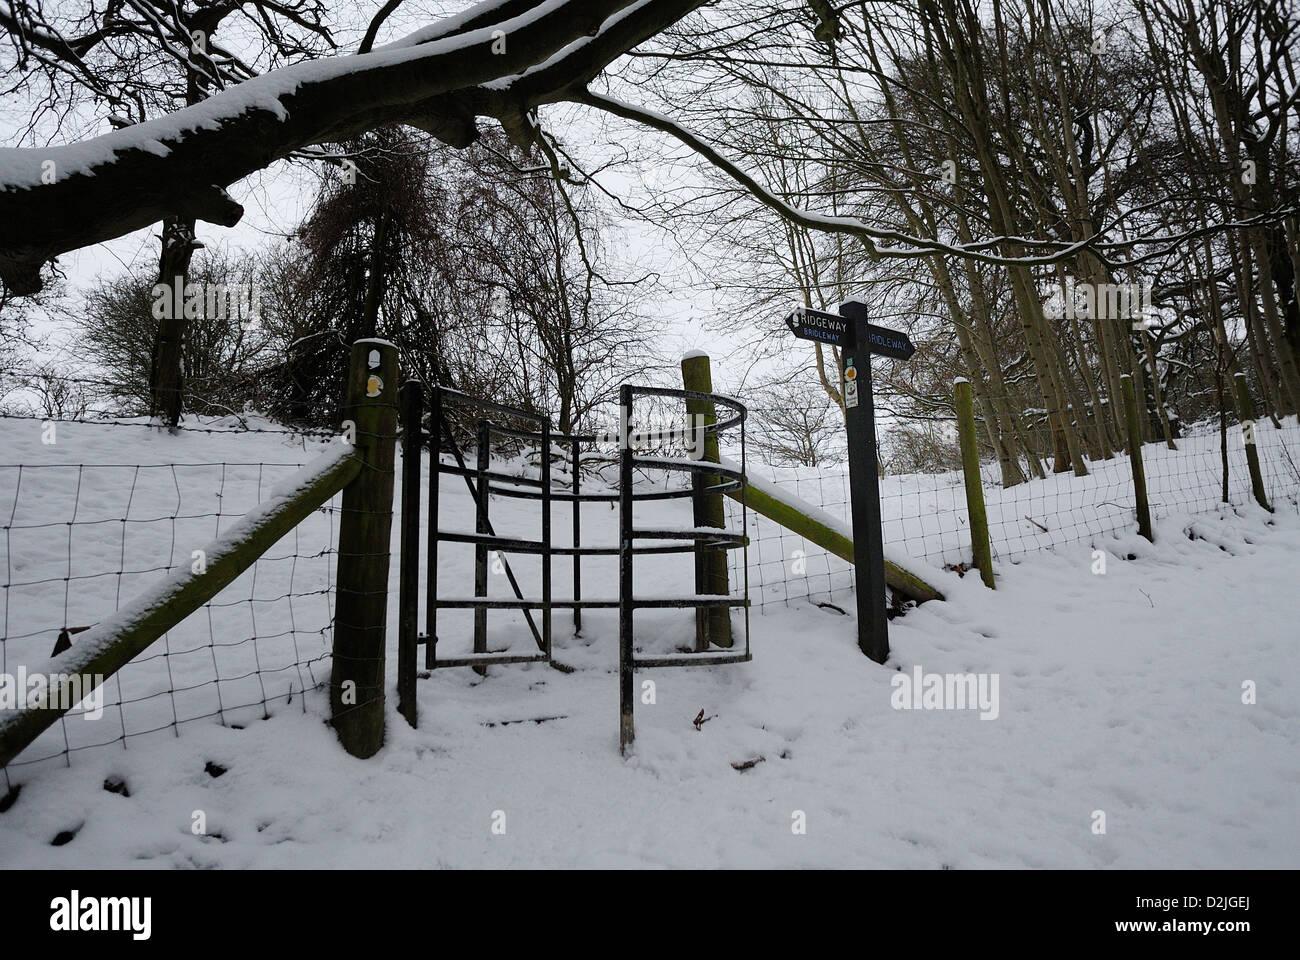 Gateway on the Ridgeway in Winter Snow Stock Photo